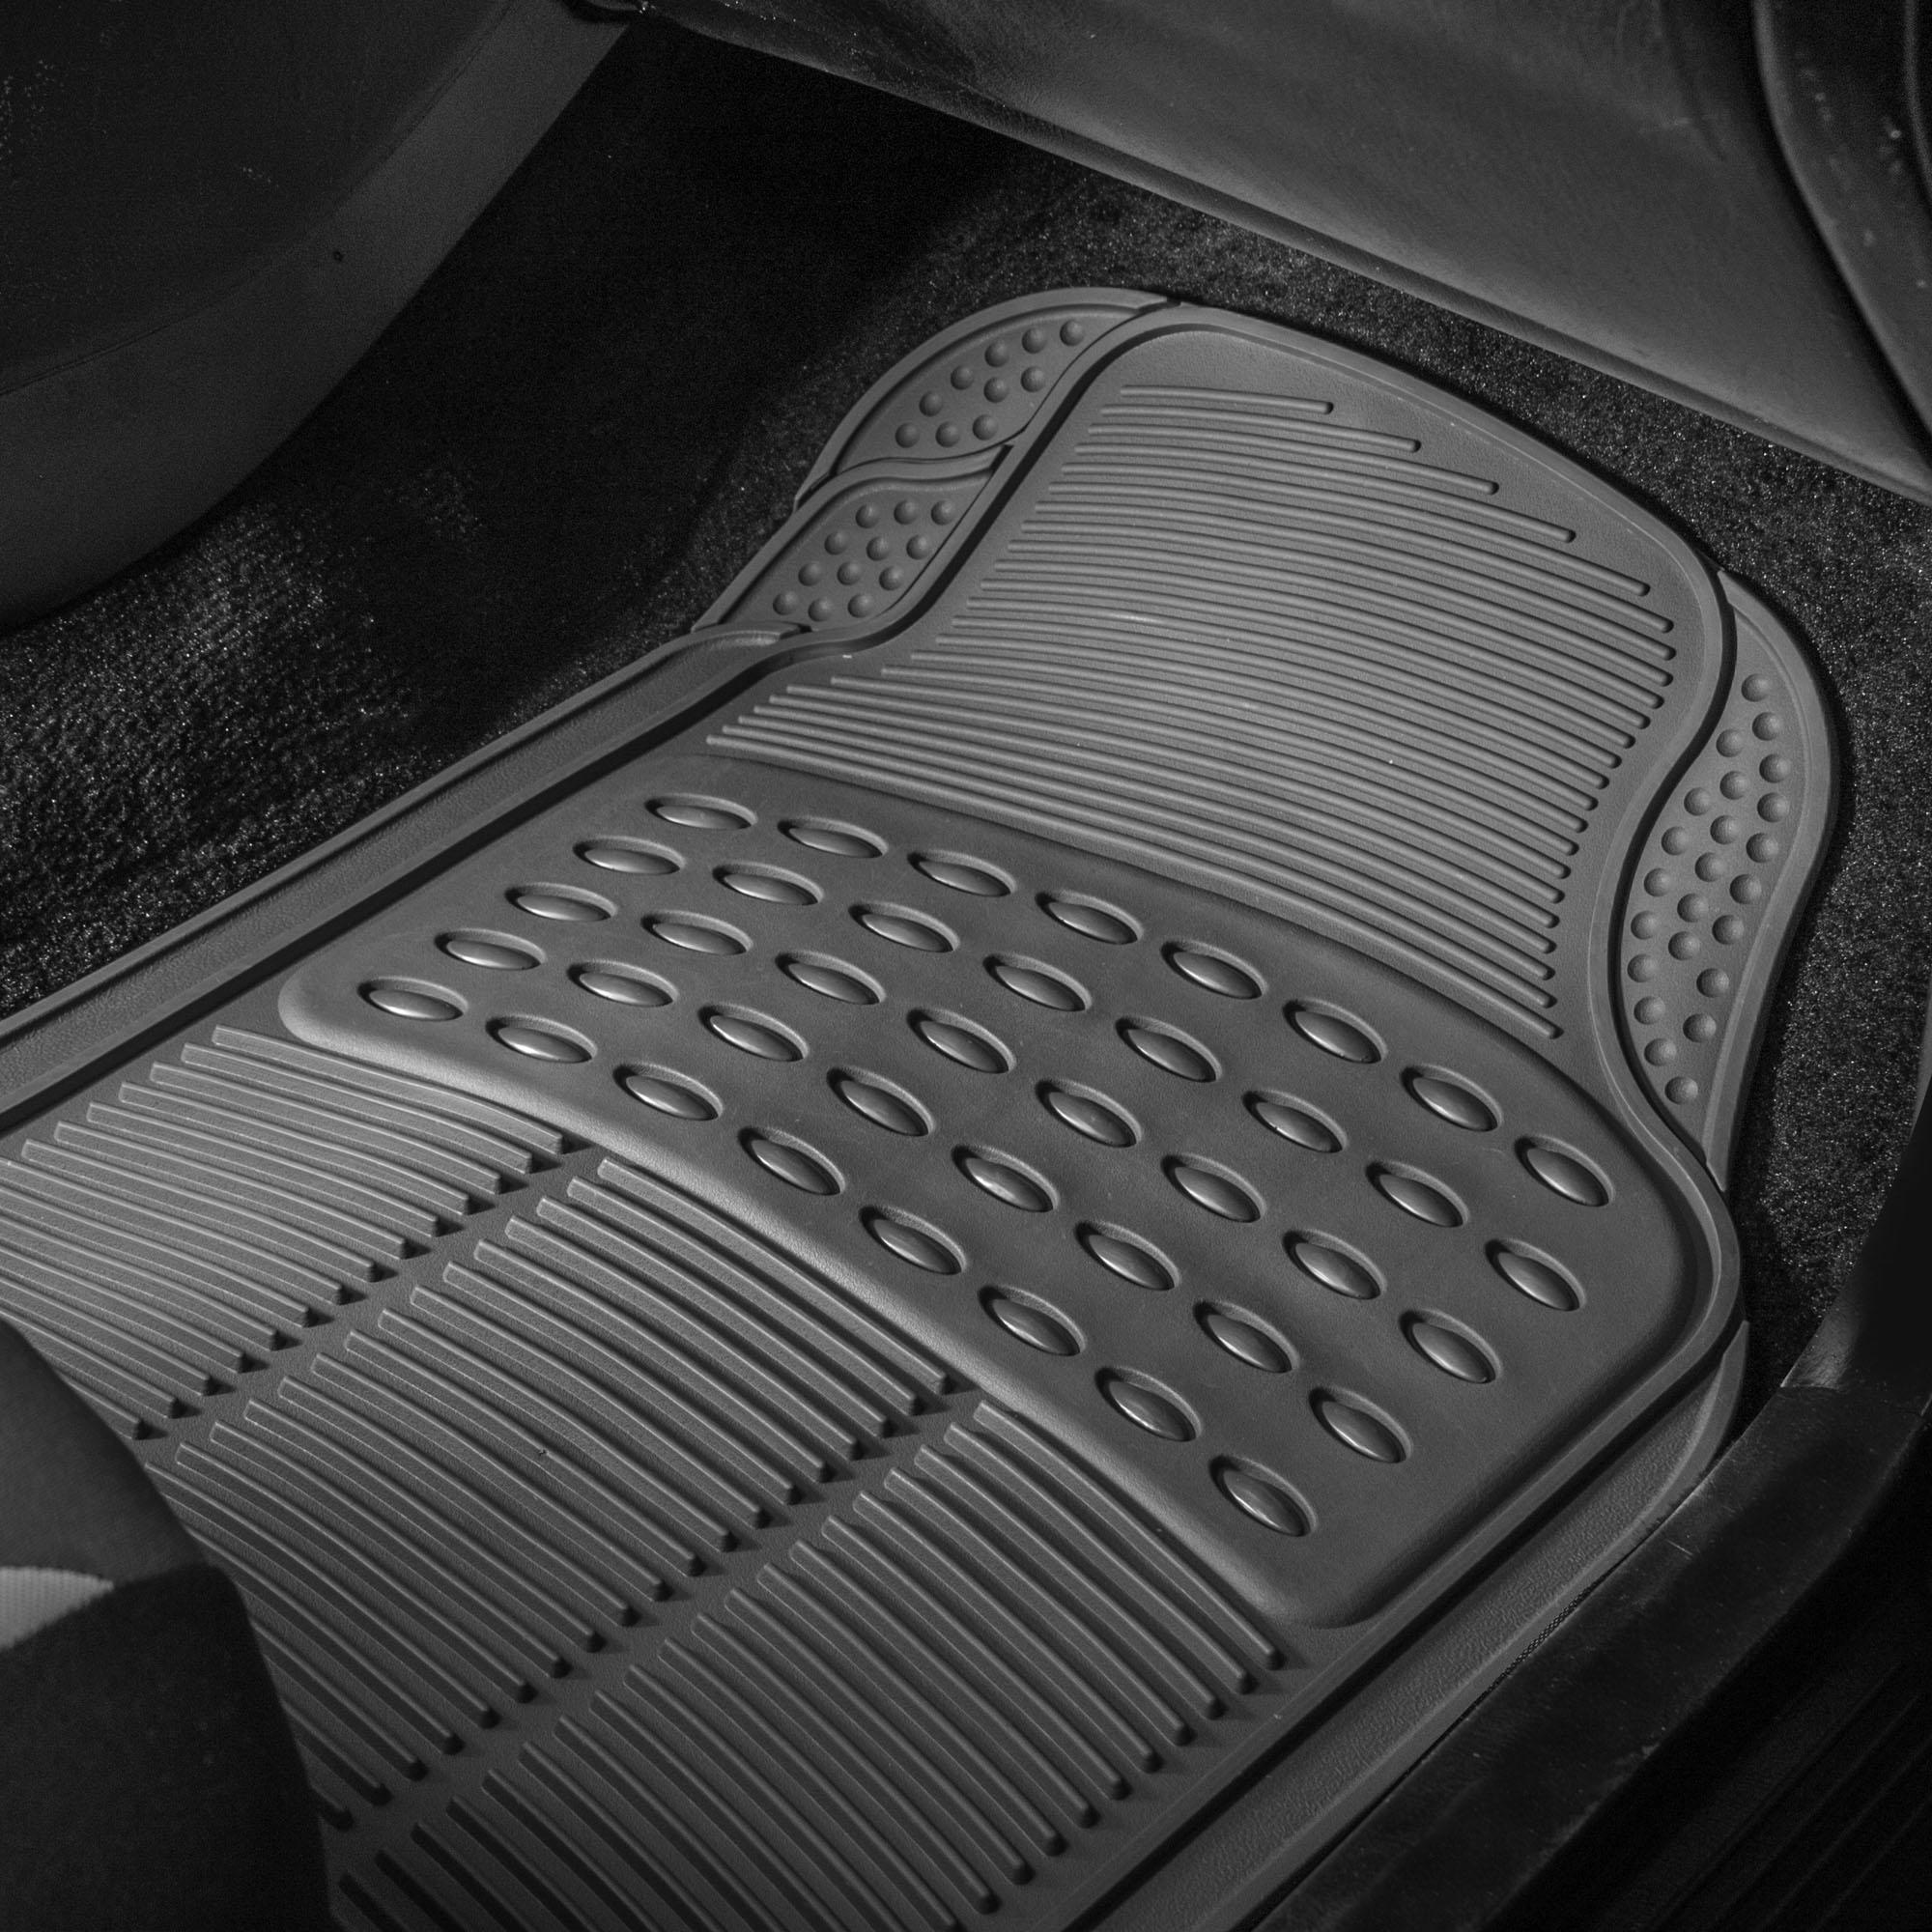 3pc-Floor-Mats-for-Auto-Car-SUV-Van-Heavy-Duty-3-Colors-w-Free-Gift thumbnail 20